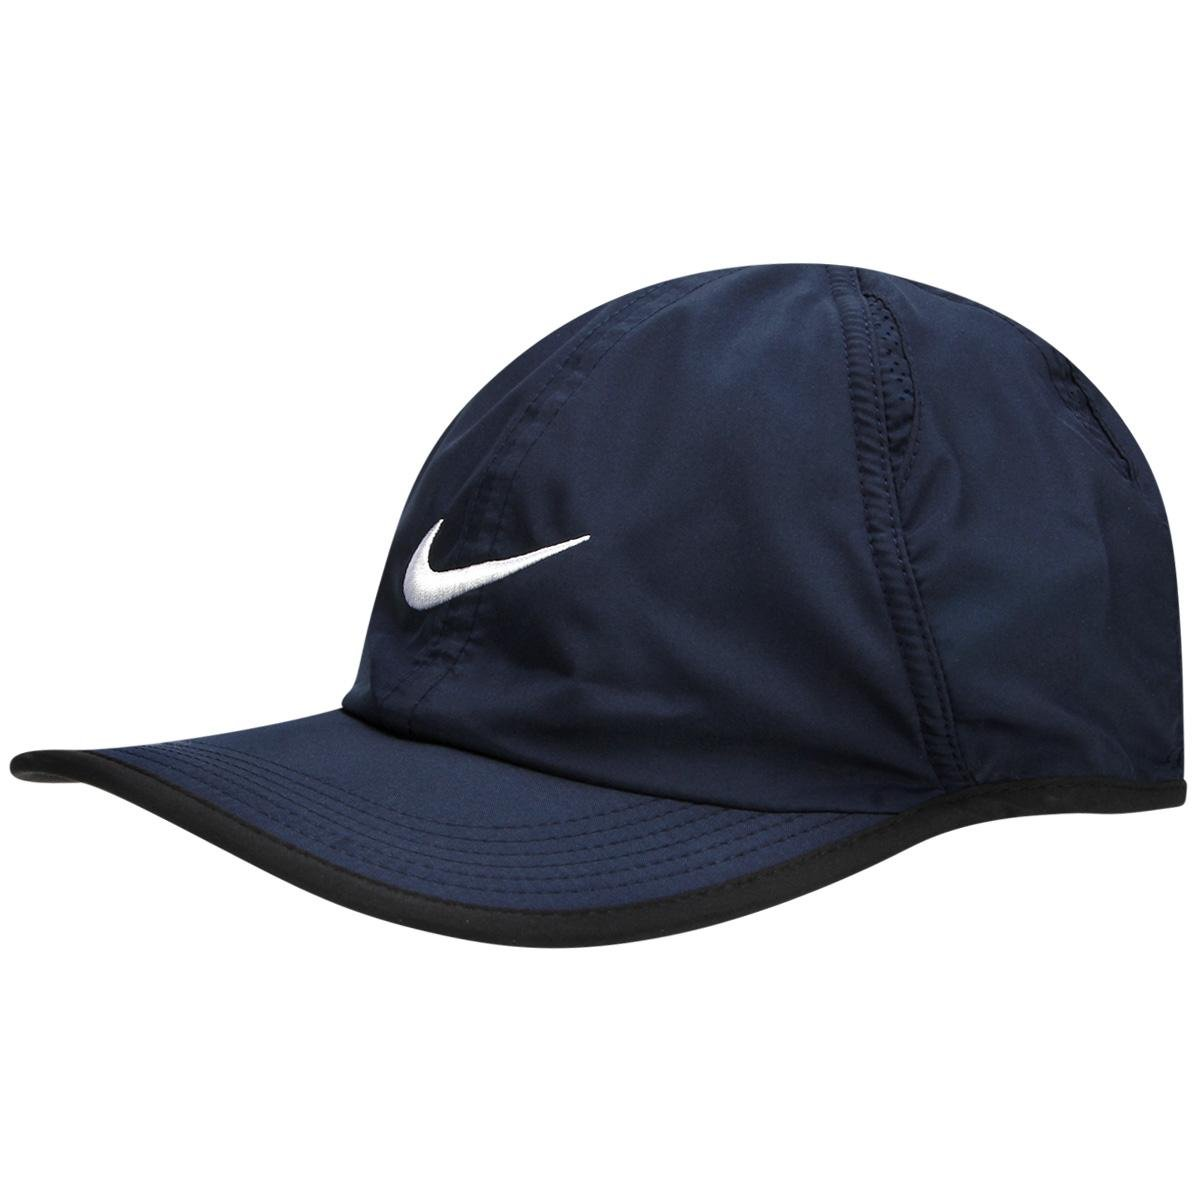 Boné Nike Featherlight - Compre Agora  47ef2d6763b